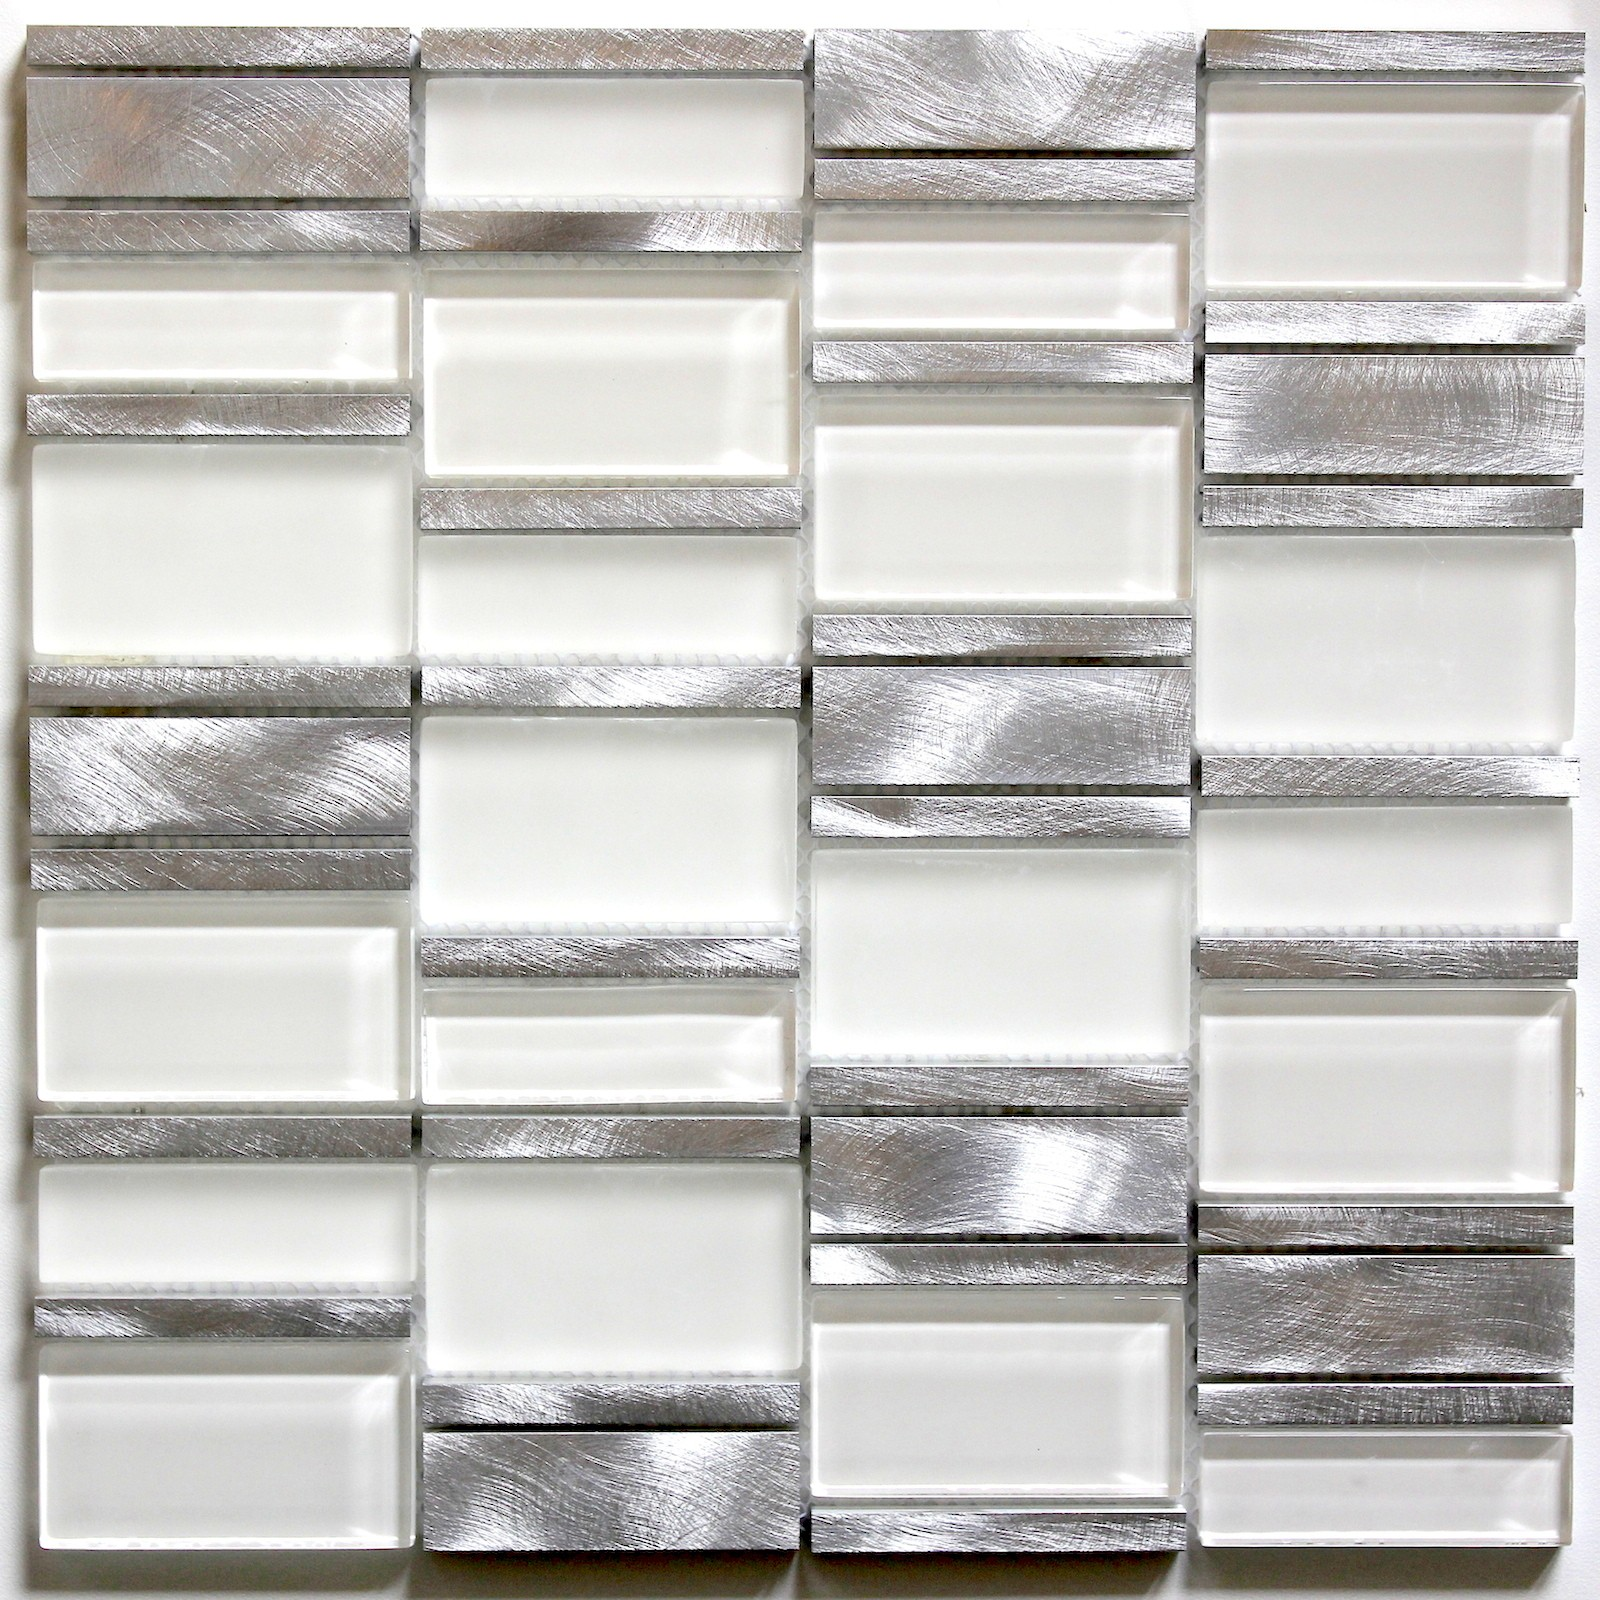 Carrelage Metro Blanc Joint Gris tile mosaic aluminum glass tiles kitchen splashback albi blanc